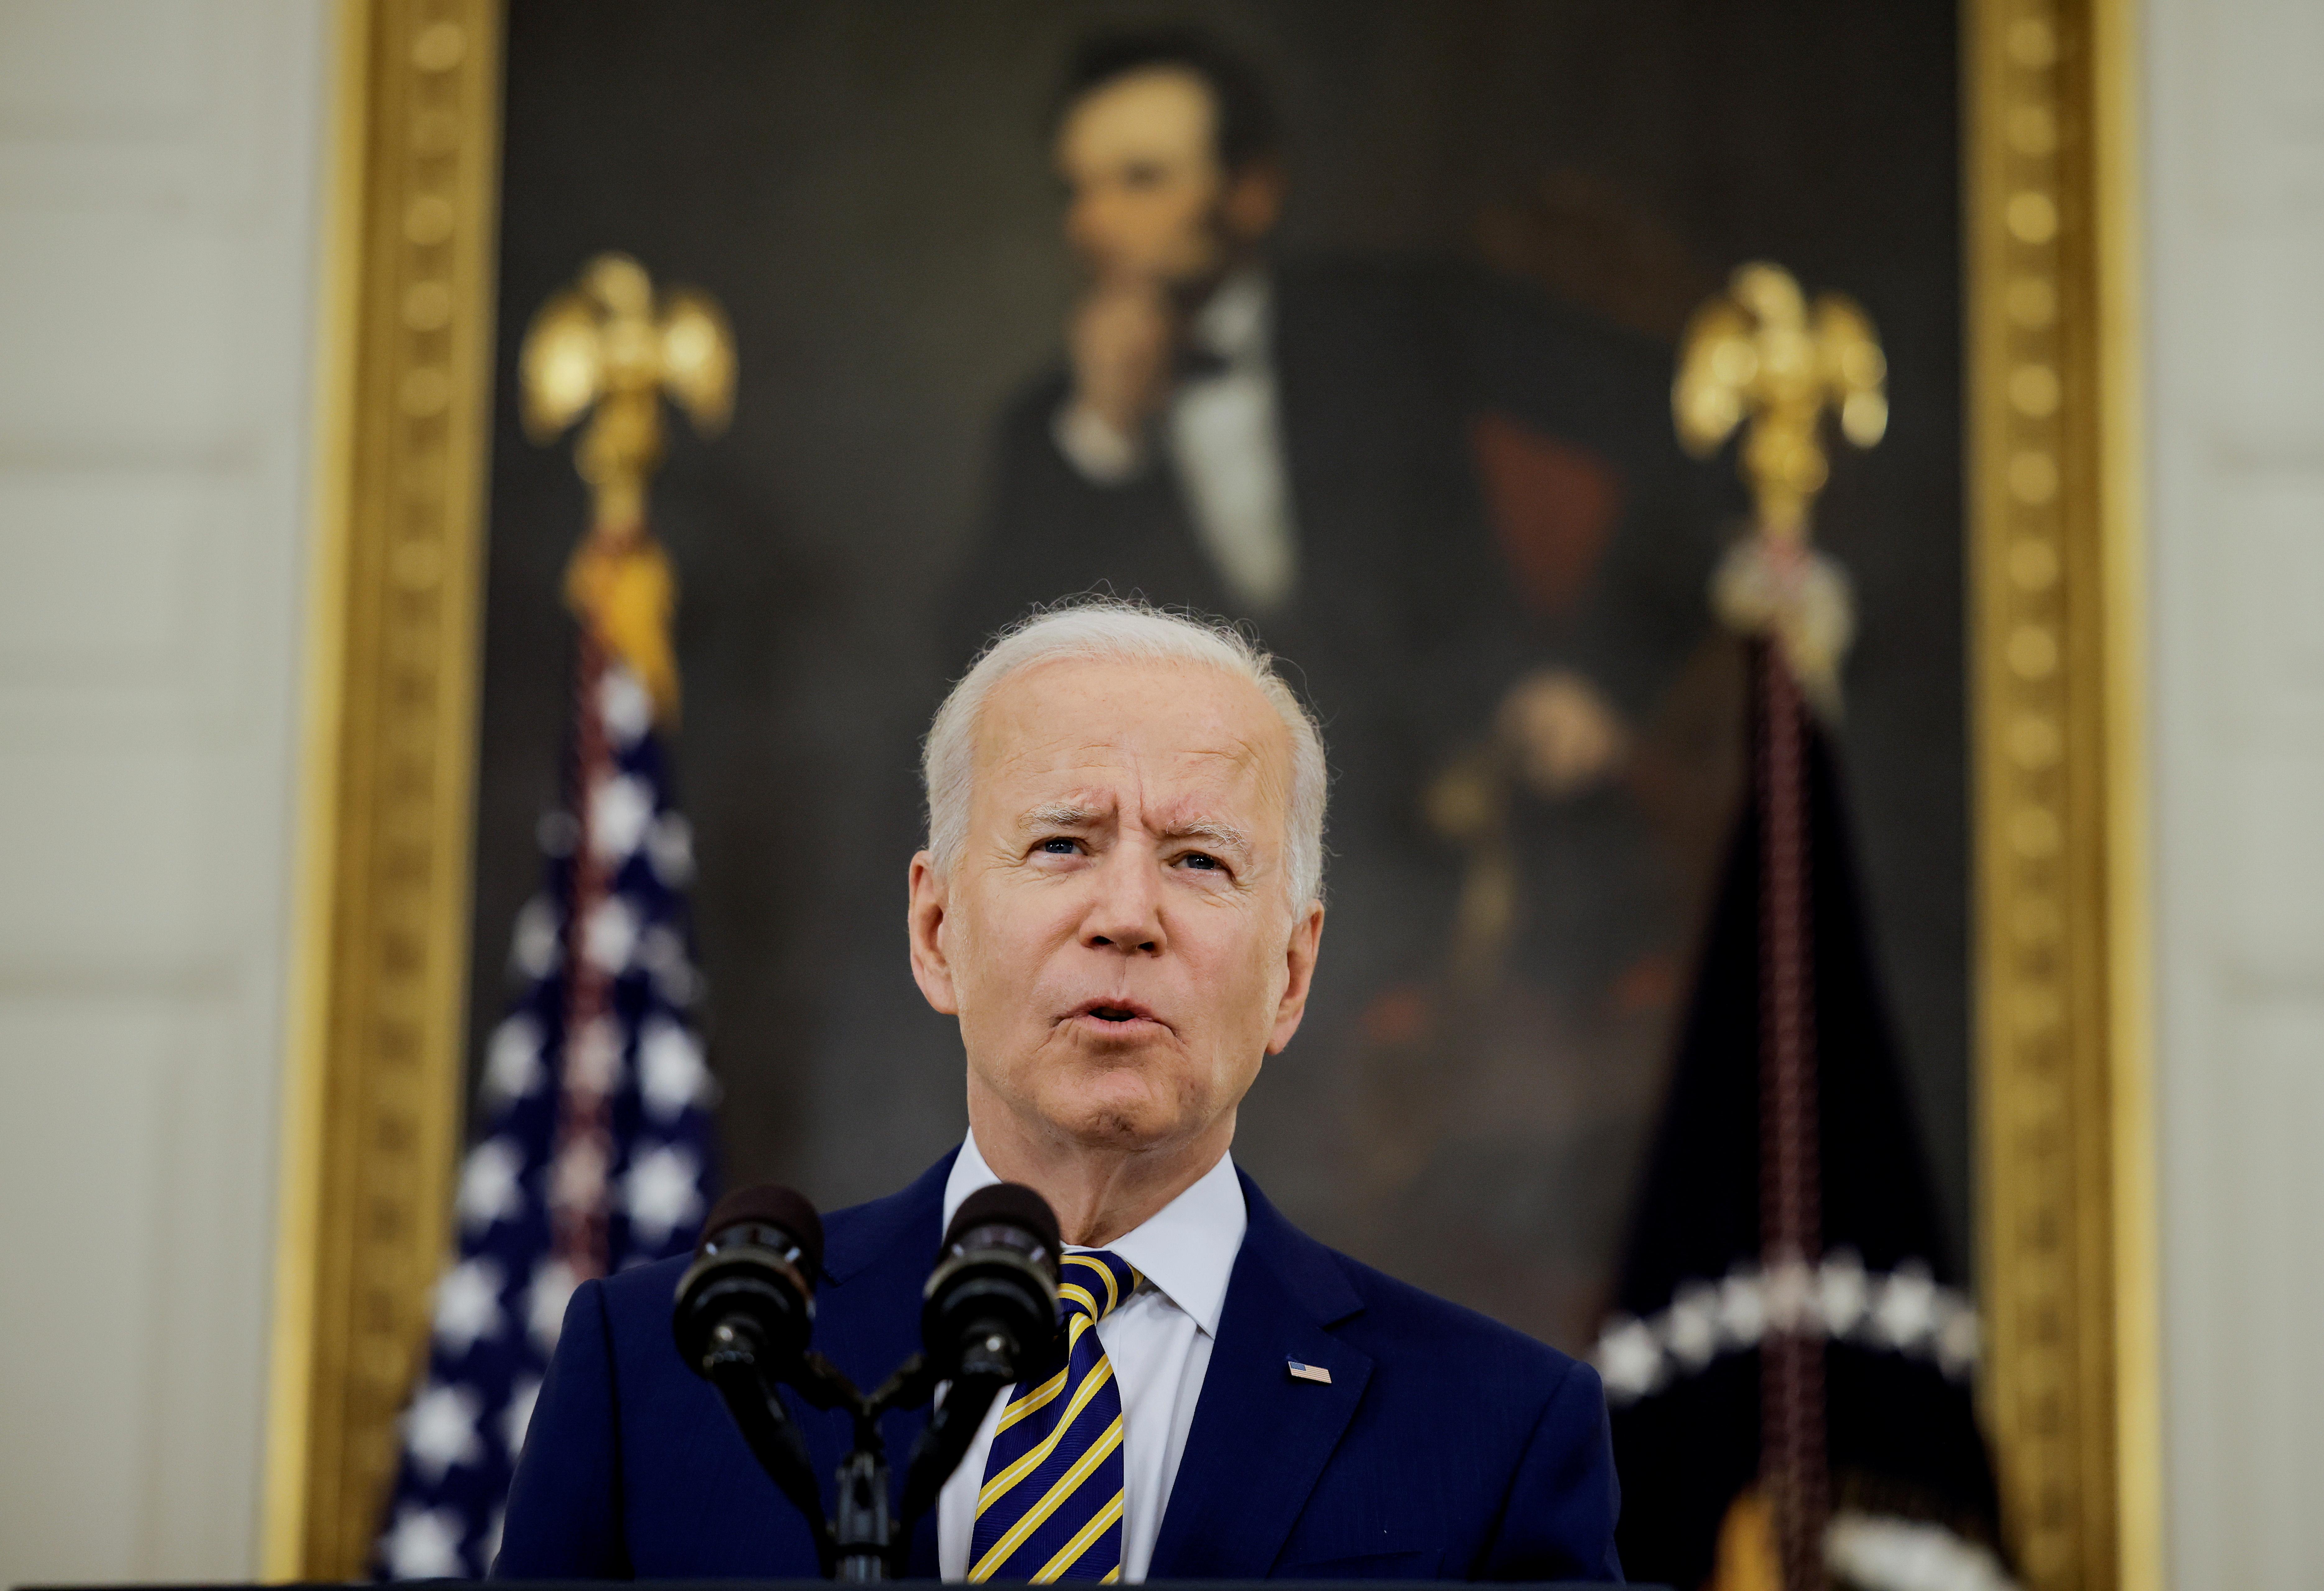 U.S. President Joe Biden speaks in the State Dining Room of the White House in Washington, U.S., June 18, 2021. REUTERS/Carlos Barria